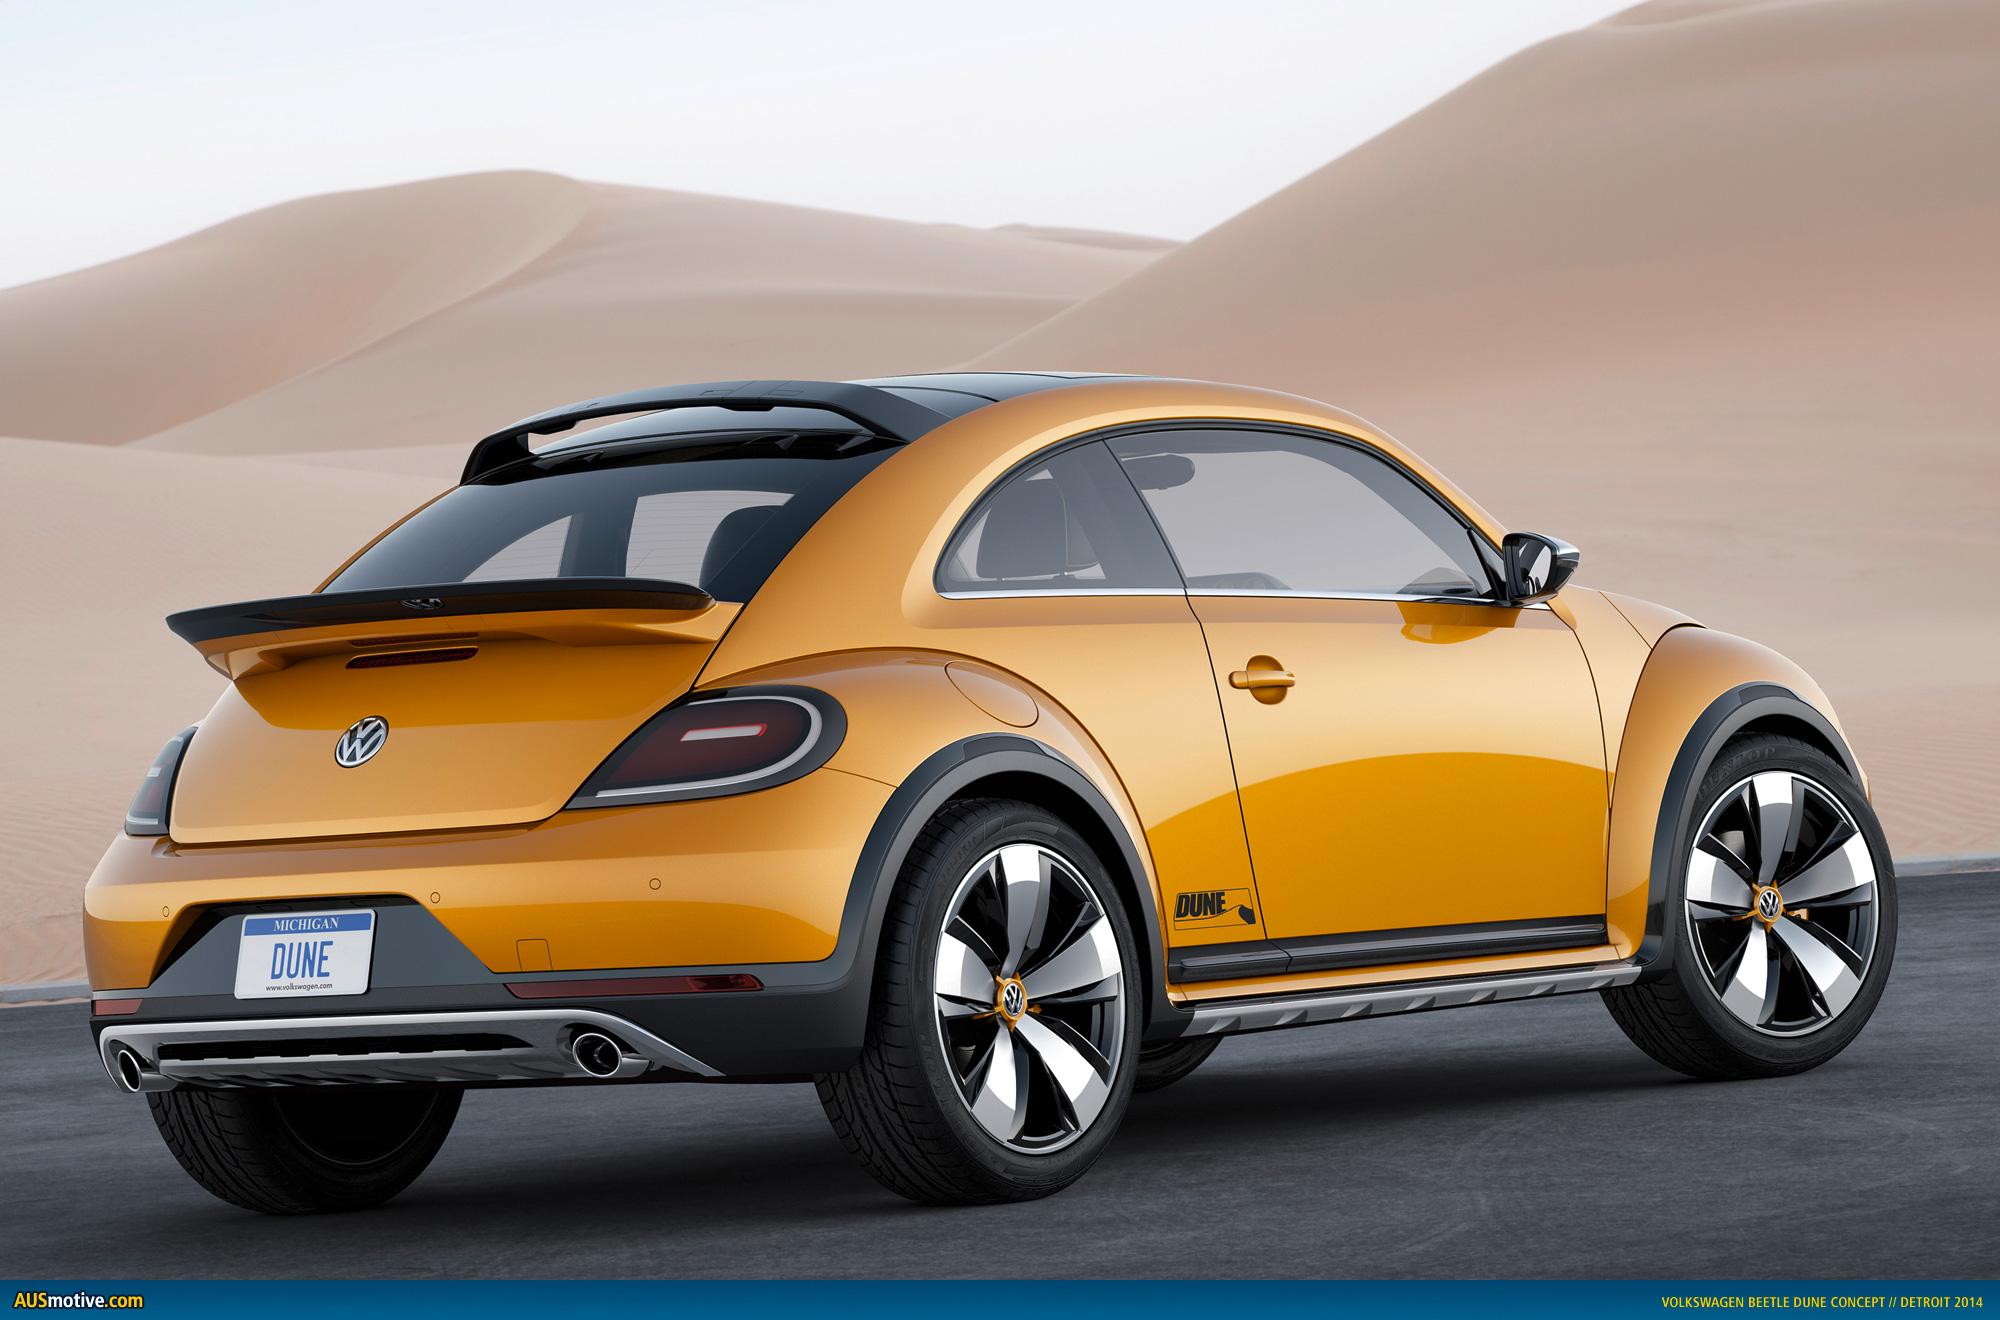 Vw Beetle Track Car >> AUSmotive.com » Detroit 2014: Volkswagen Beetle Dune concept